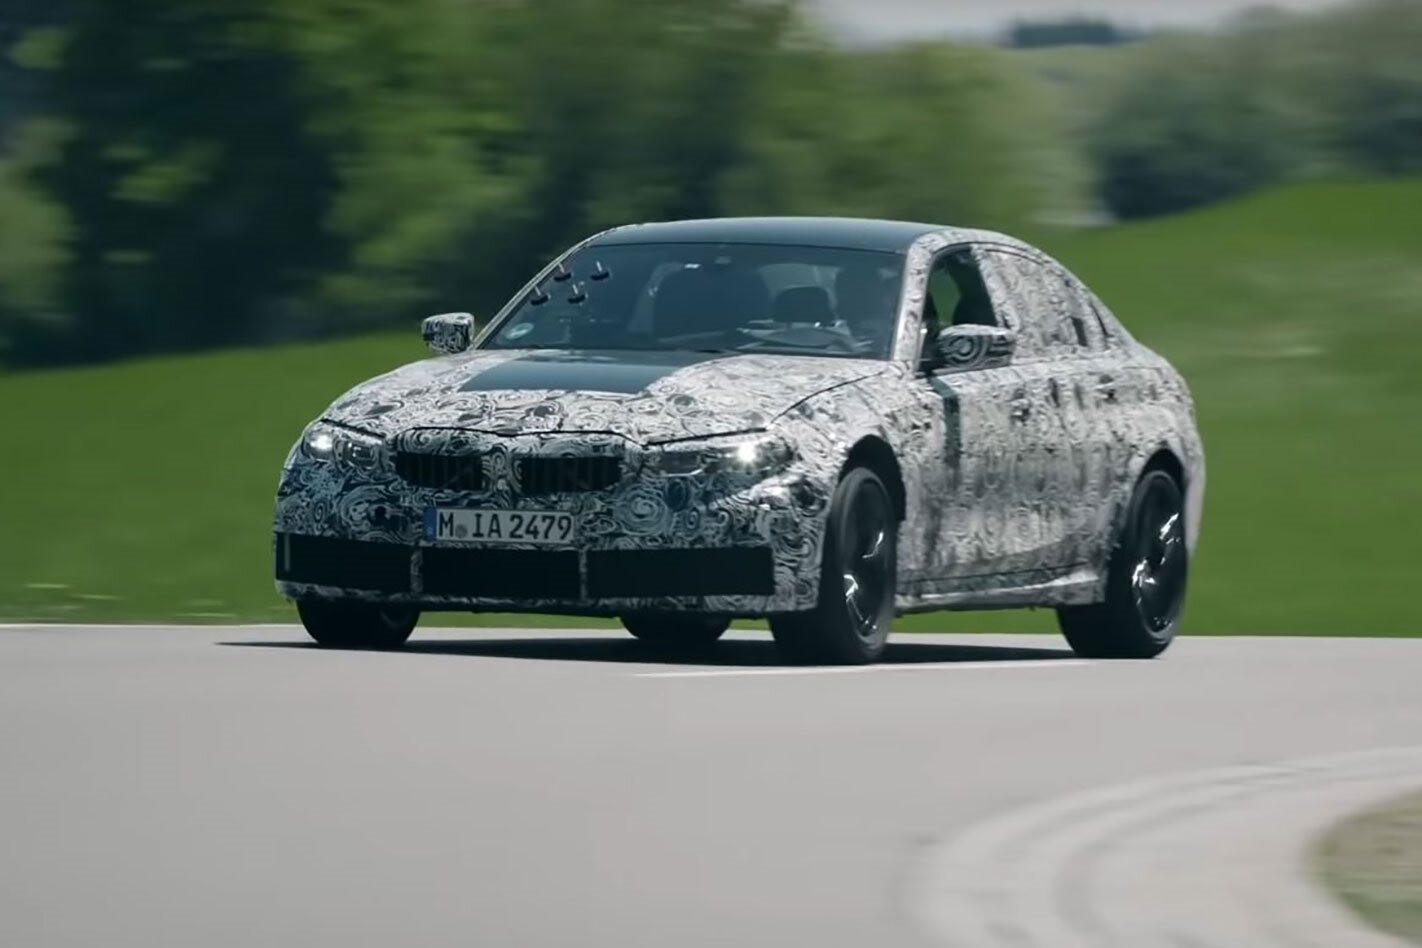 2021 G80 BMW M3 Nurburgring development video teaser